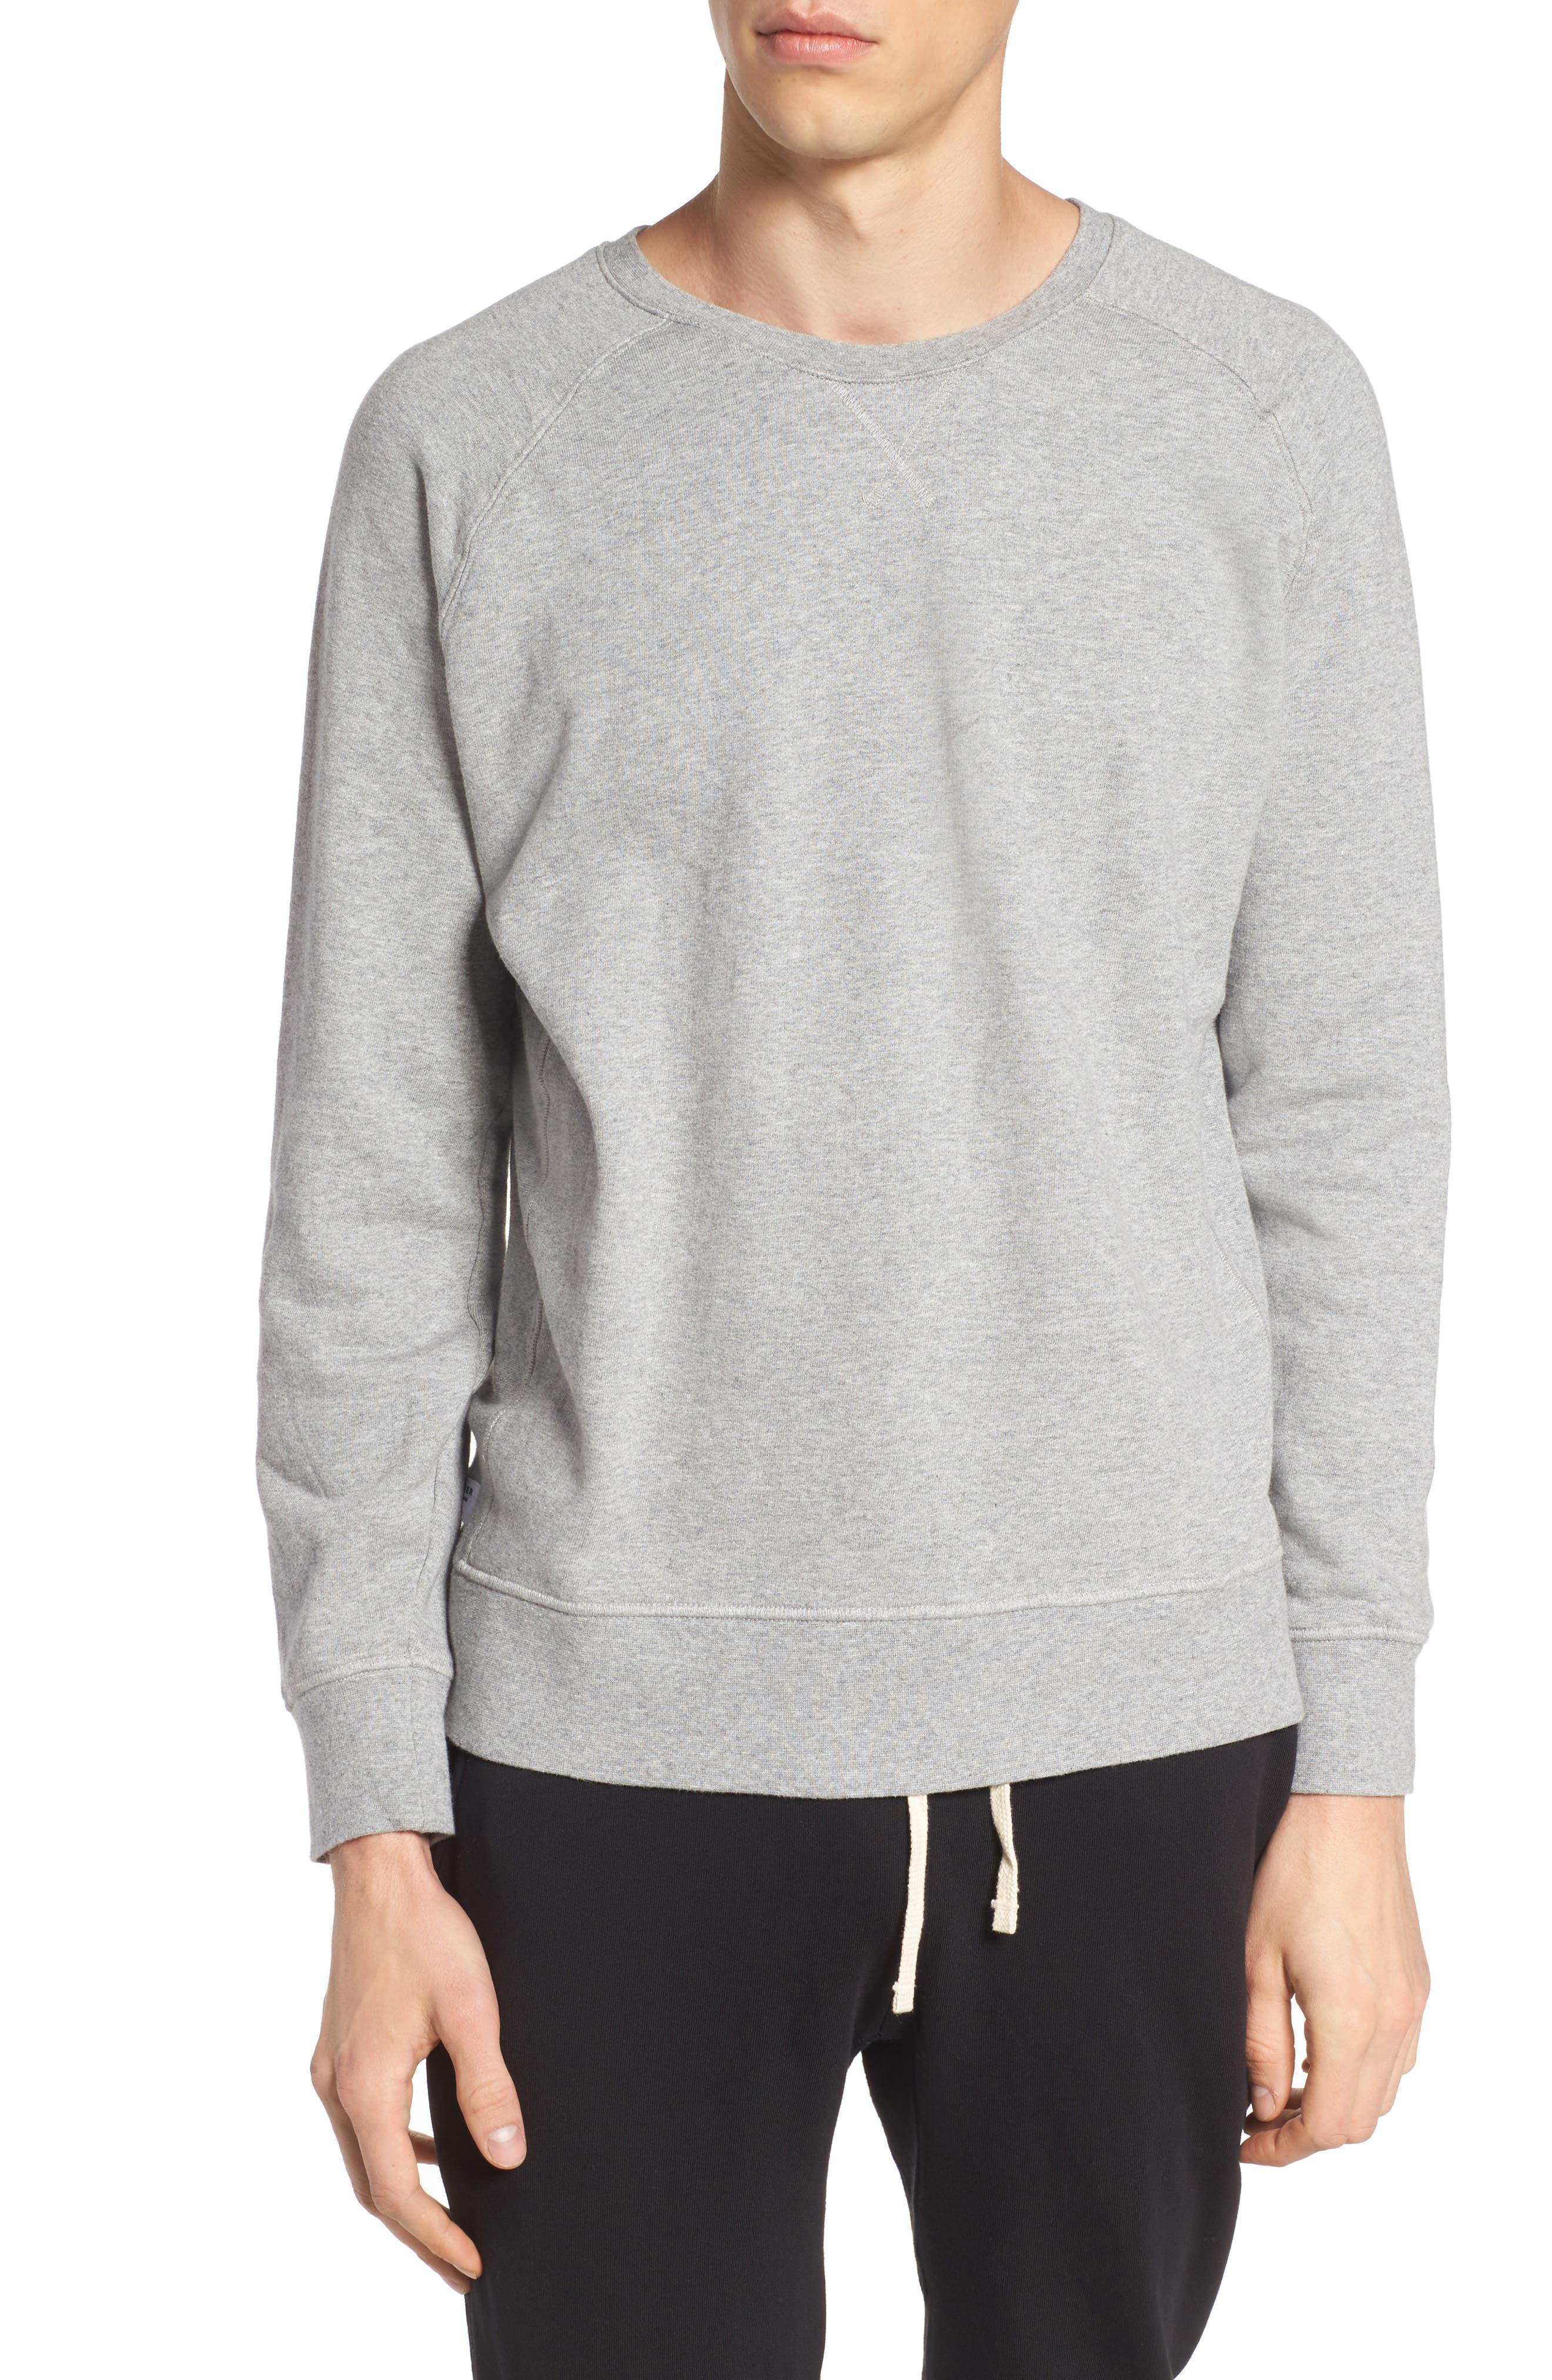 Main Image - Richer Poorer Lounge Crewneck Sweatshirt